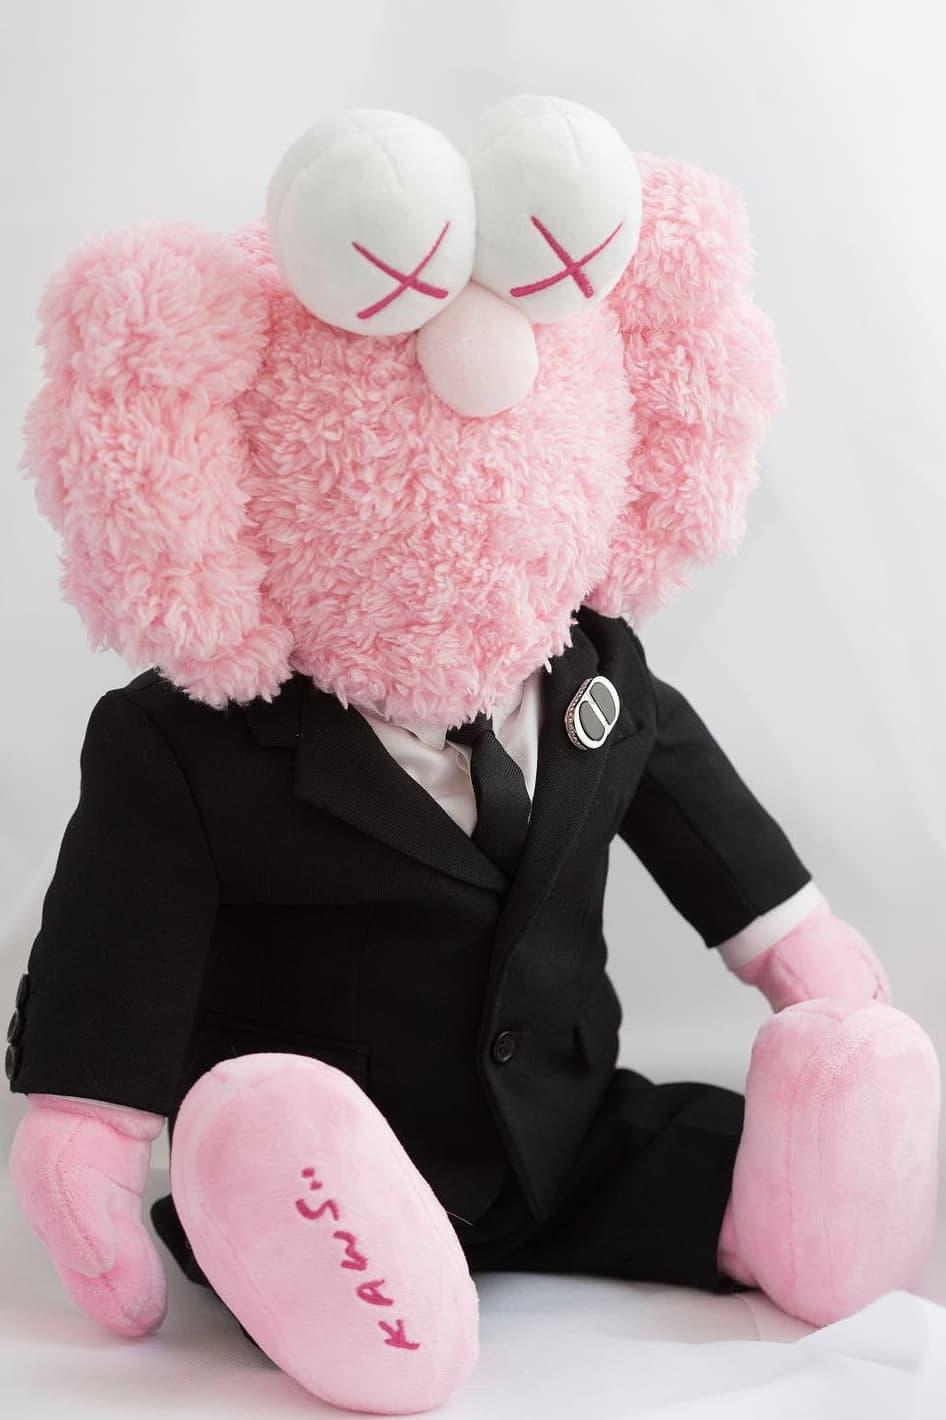 Dior Homme x Kaws Pink BFF Plush Kim Jones Paris Fashion Week Men's Spring Summer 2019